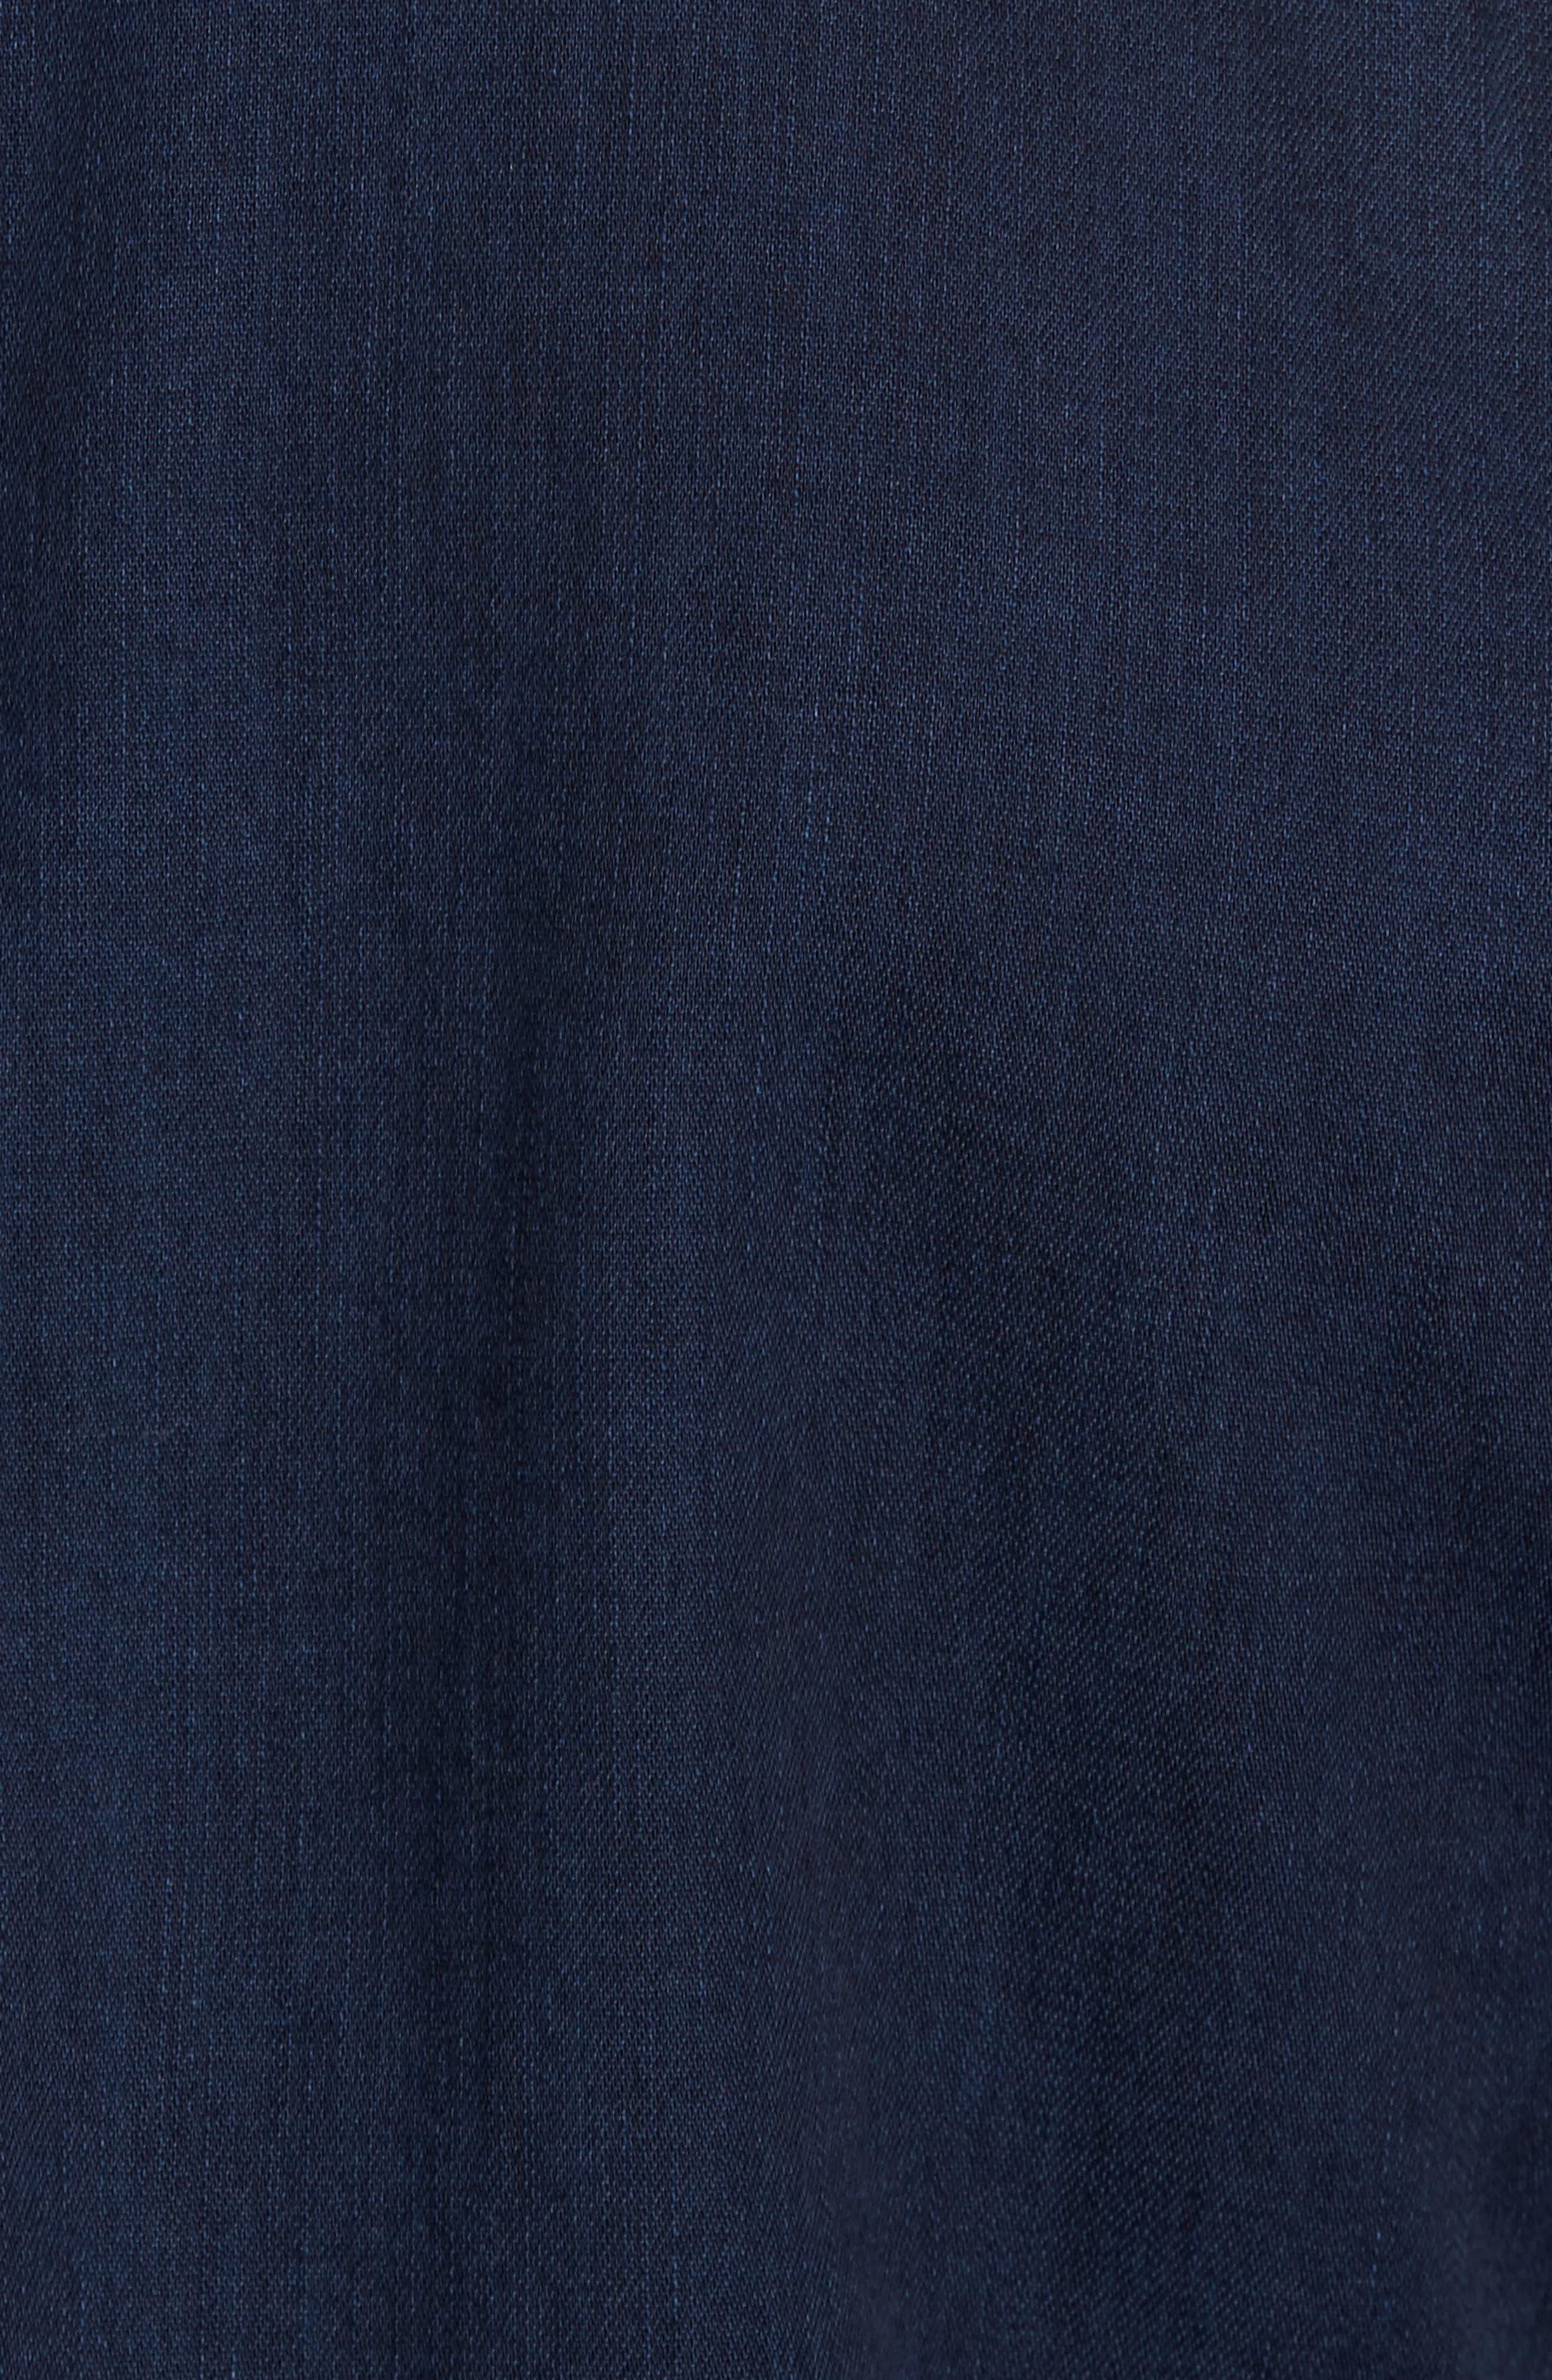 Pocketless Western Denim Shirt,                             Alternate thumbnail 5, color,                             Midnight